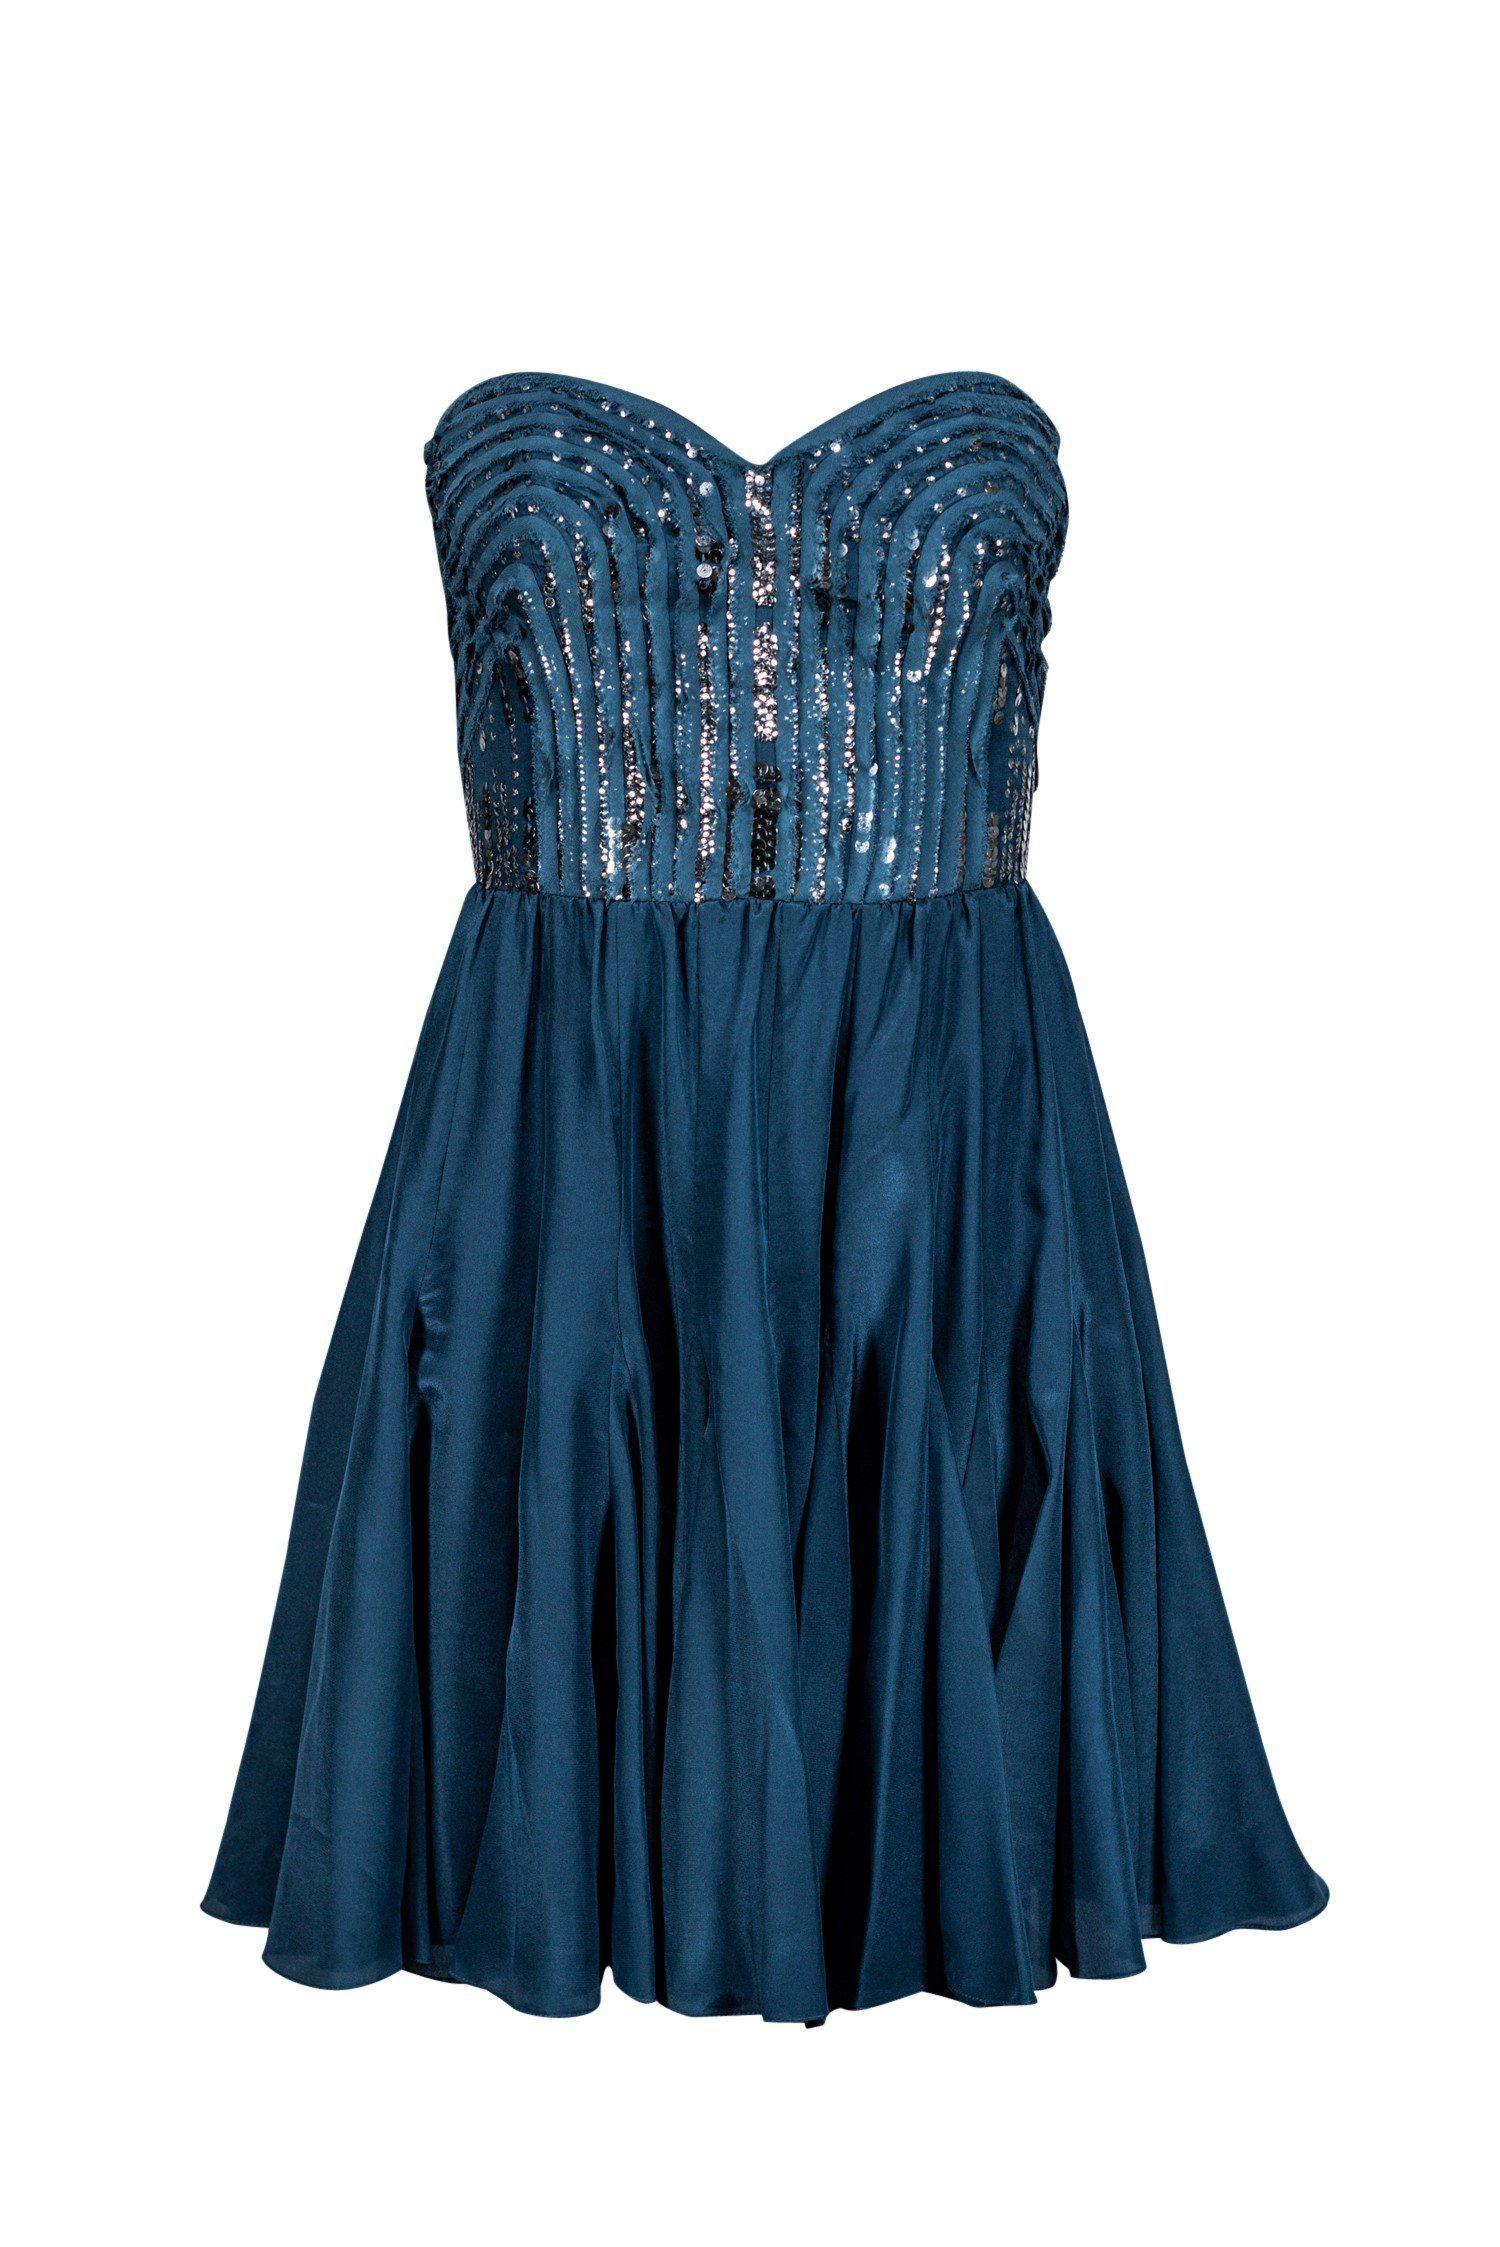 Rebecca Taylor Dark Teal Cocktail W Sequins Sz 6 In 2021 Dark Teal Dress Dresses Strapless Cocktail Dresses [ 2247 x 1500 Pixel ]